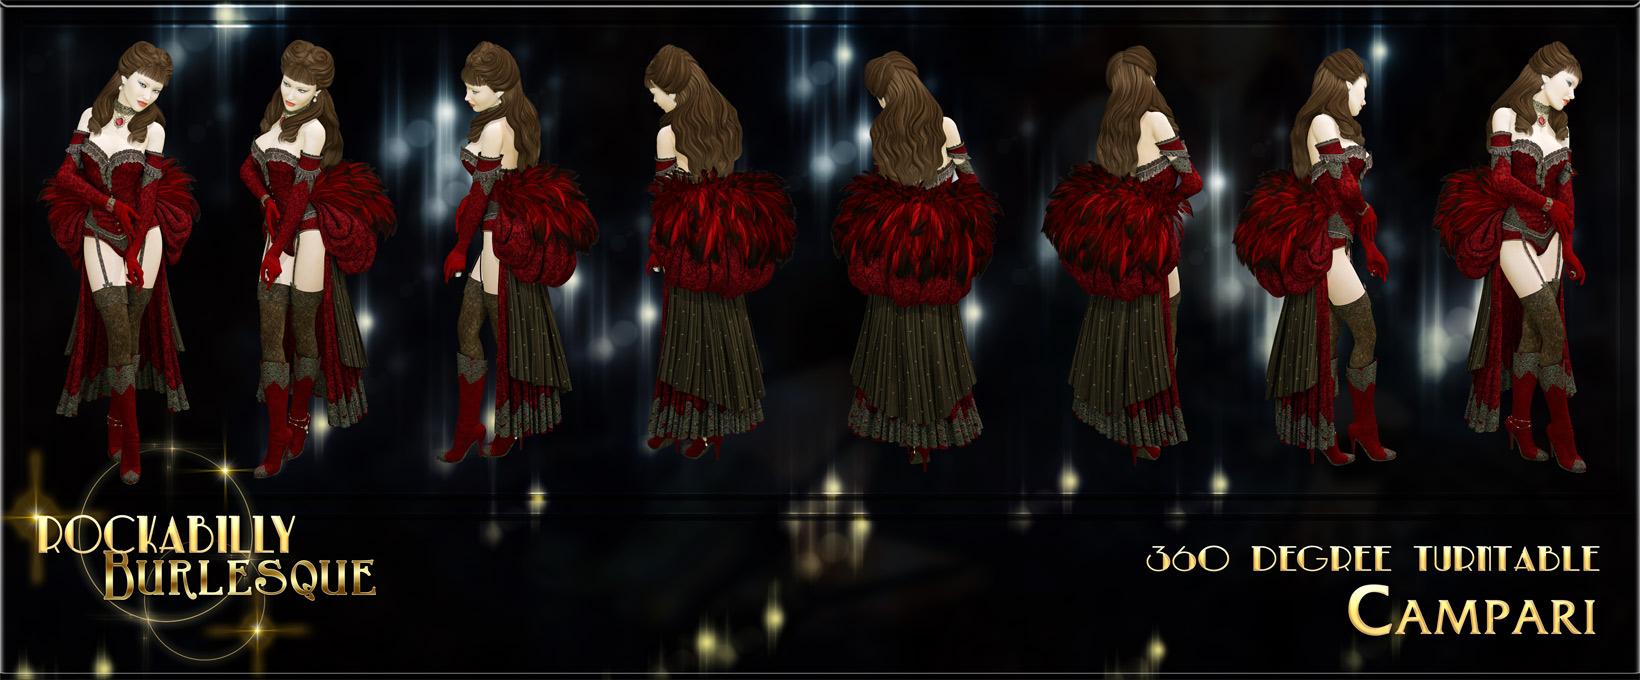 Rockabilly Burlesque for V4 by: NetherworksAnna BenjaminLady LittlefoxRuntimeDNASyyd, 3D Models by Daz 3D